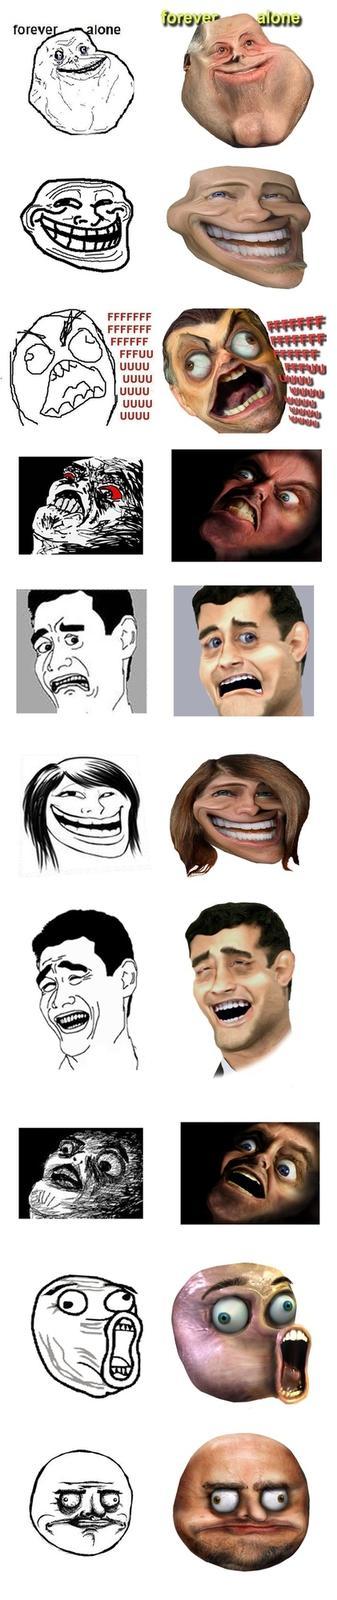 10-reaction-faces-untooned-21522-1292857122-3.jpg